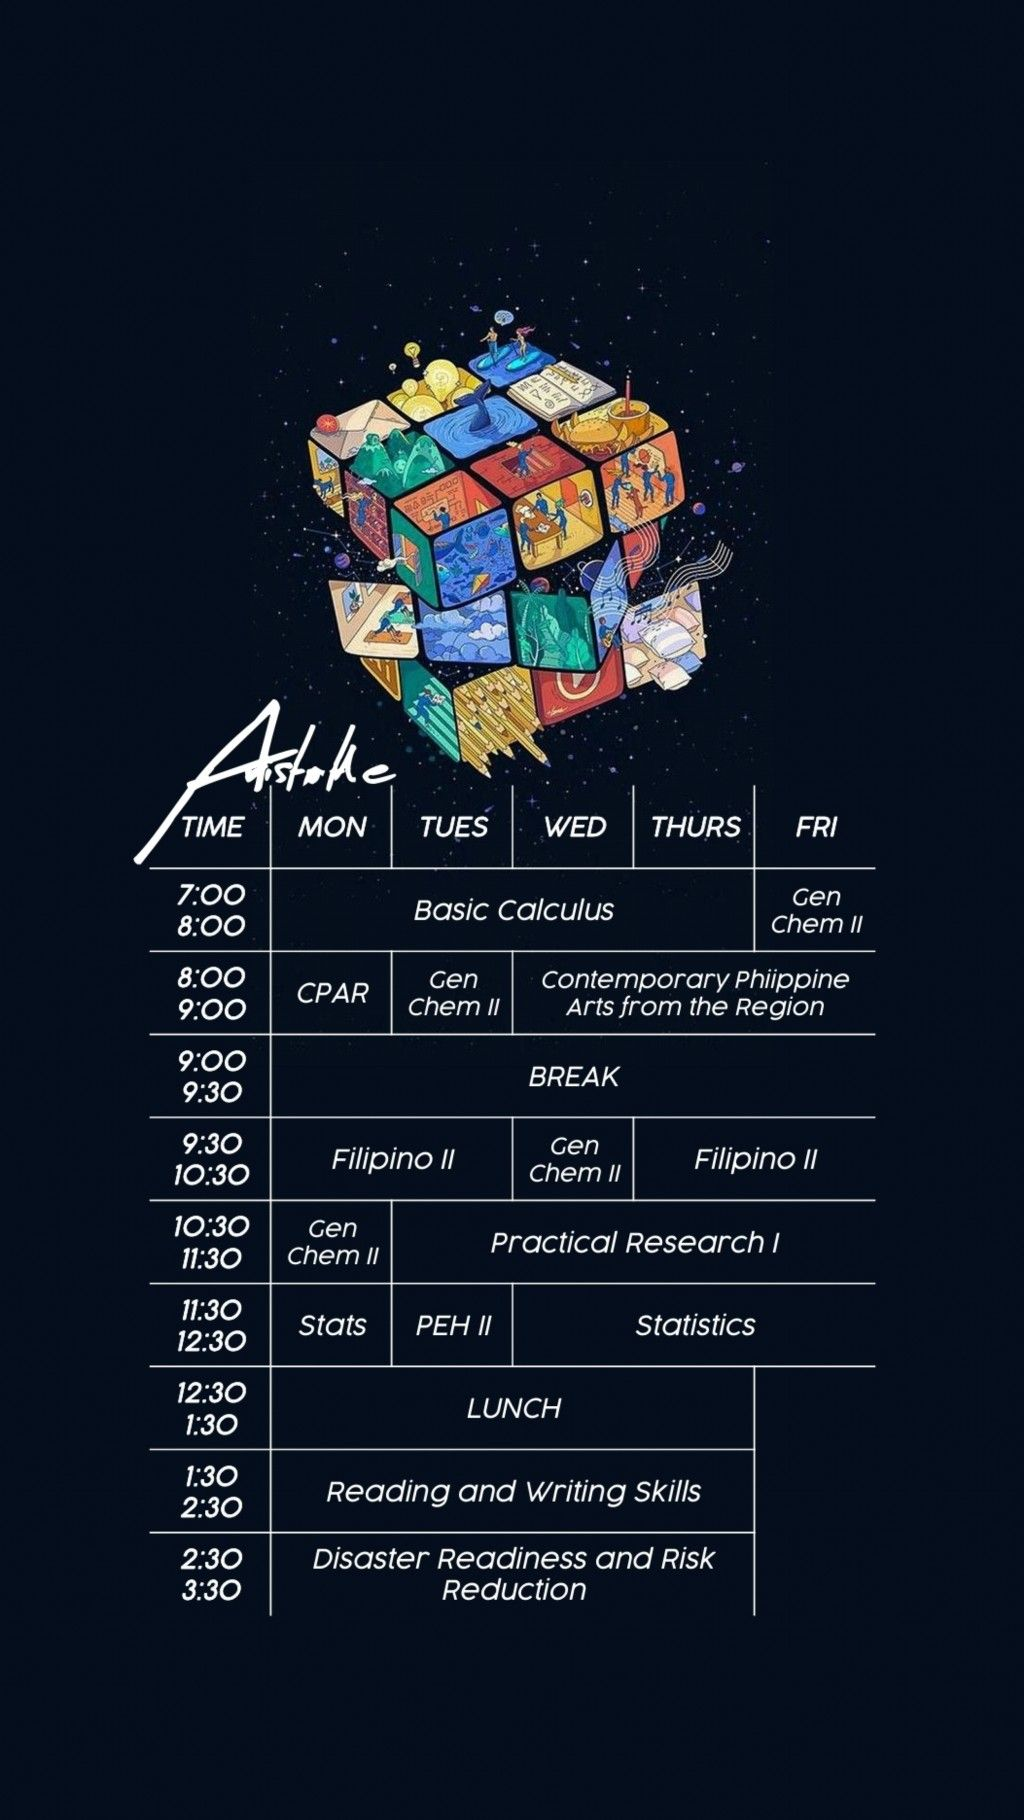 Schedule Wallpaper Class Schedule Template Schedule Design